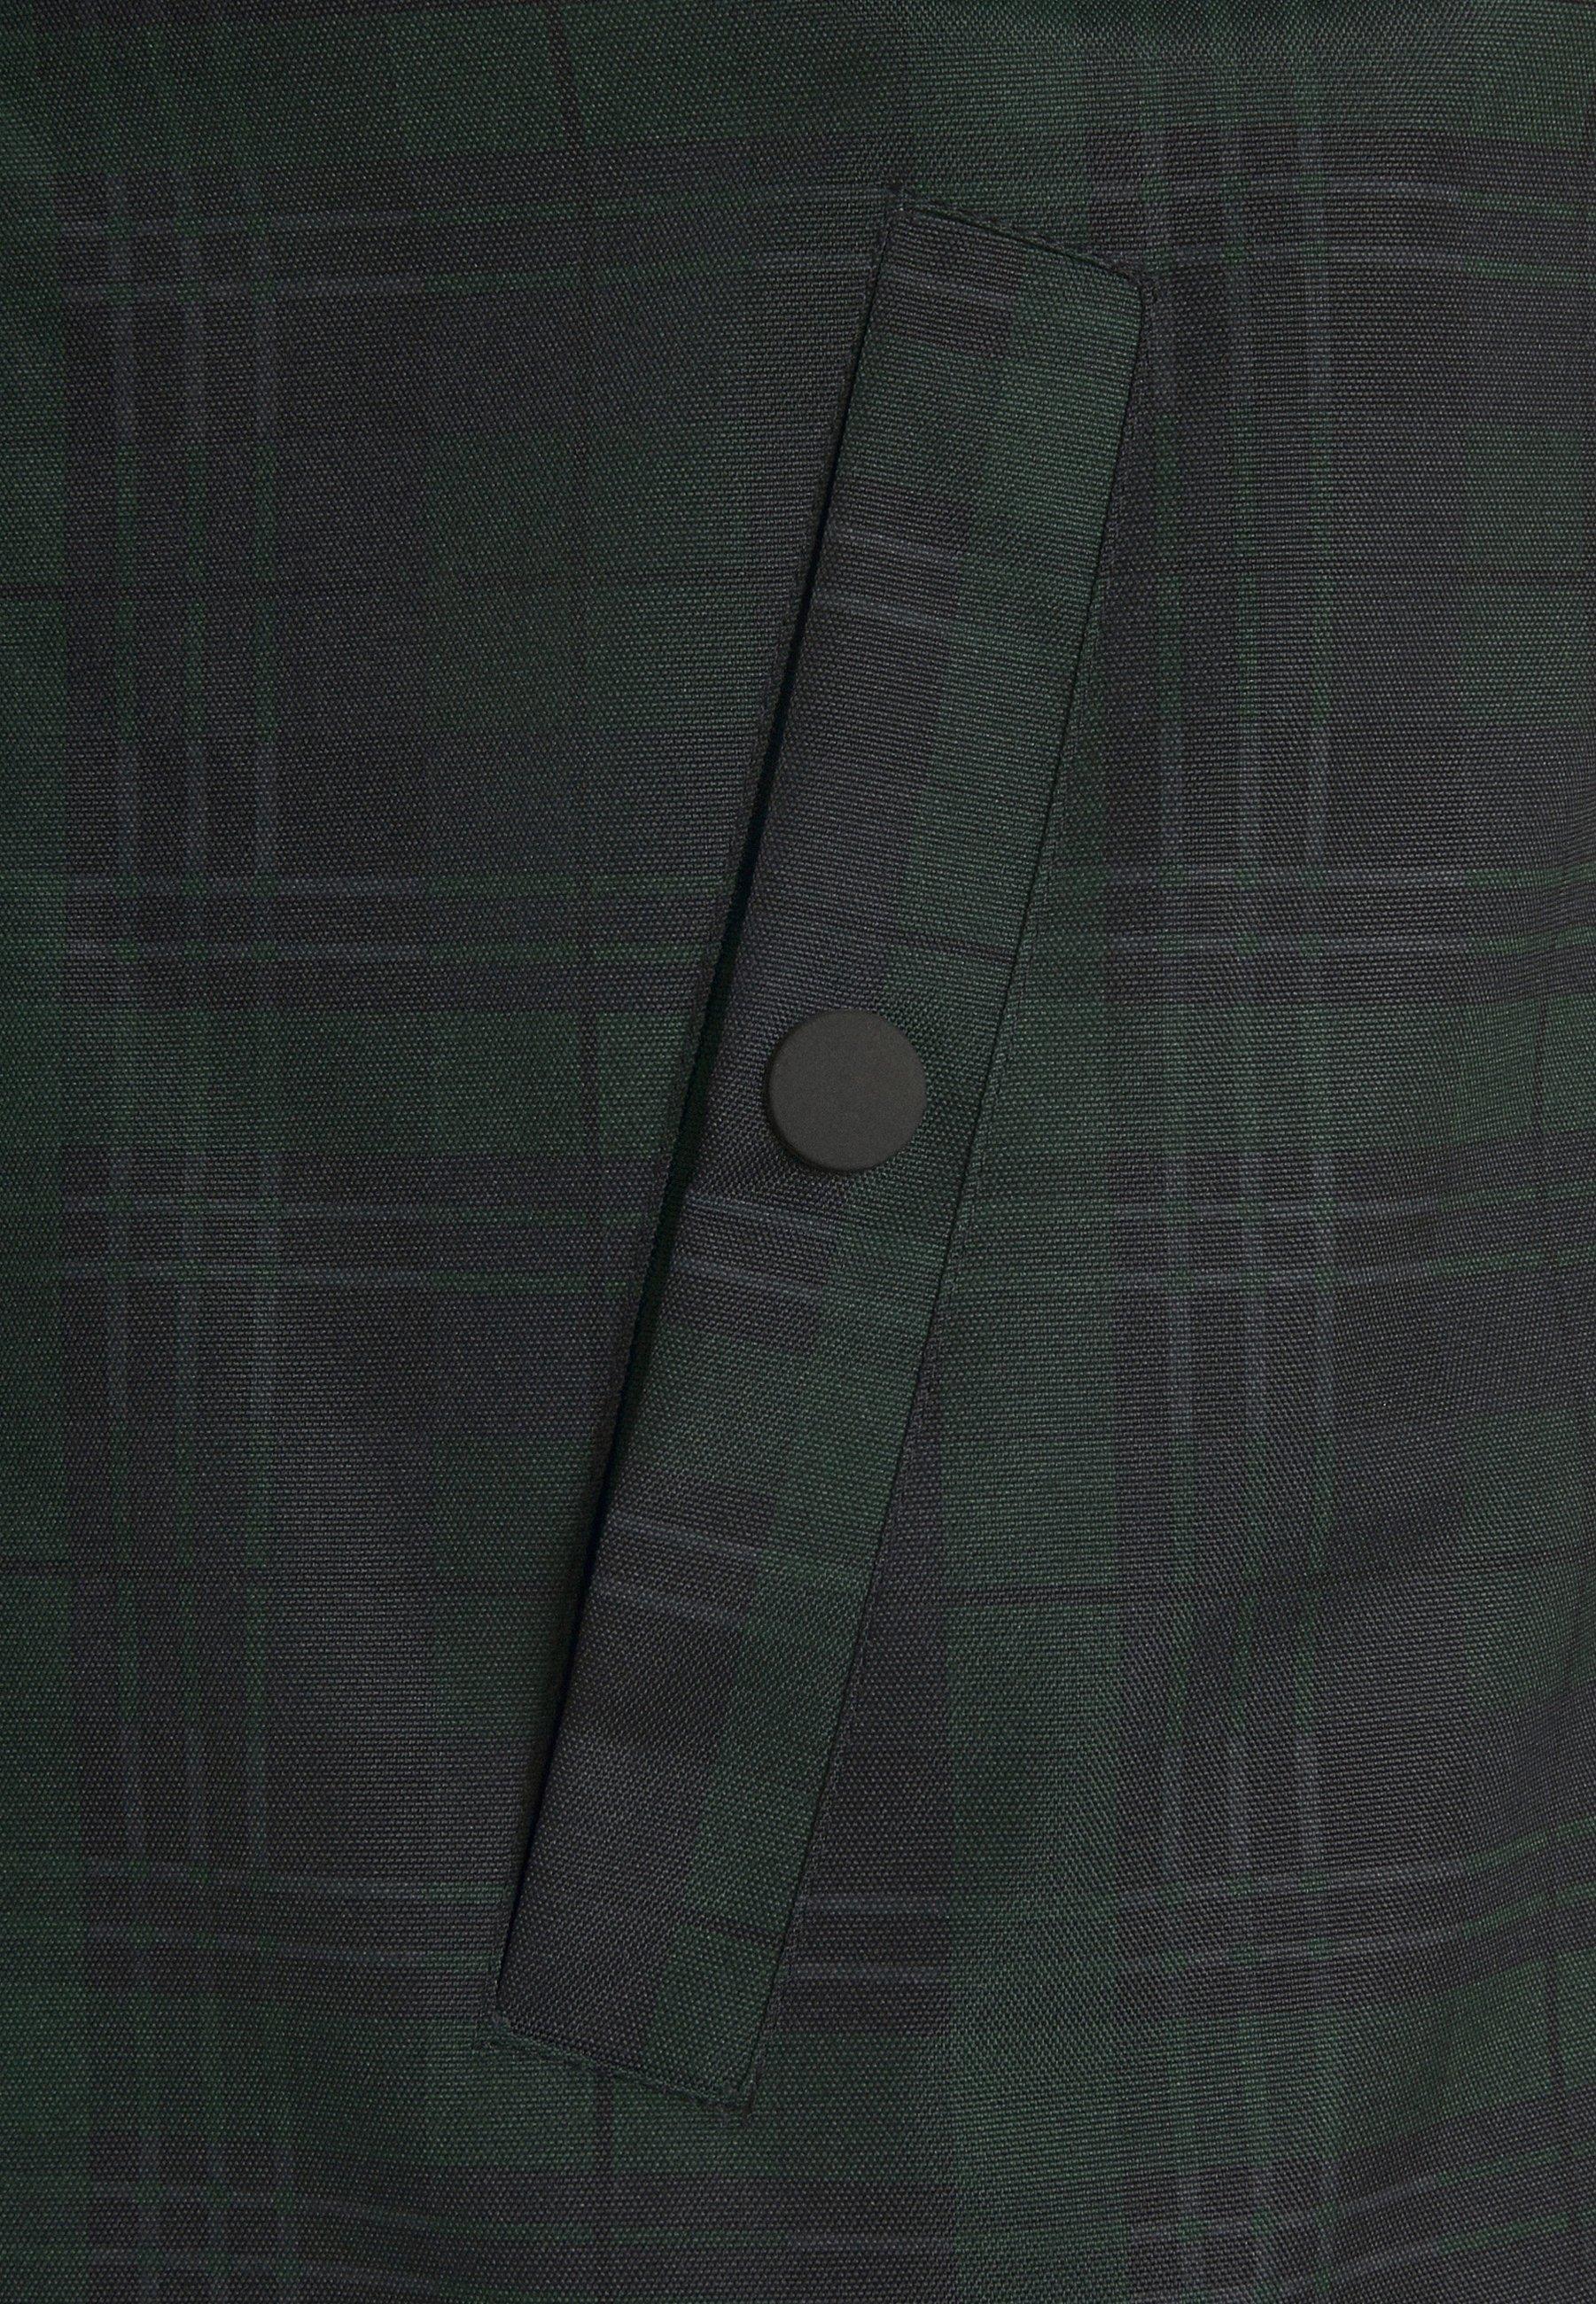 Homme CHADWICK - Manteau court - black